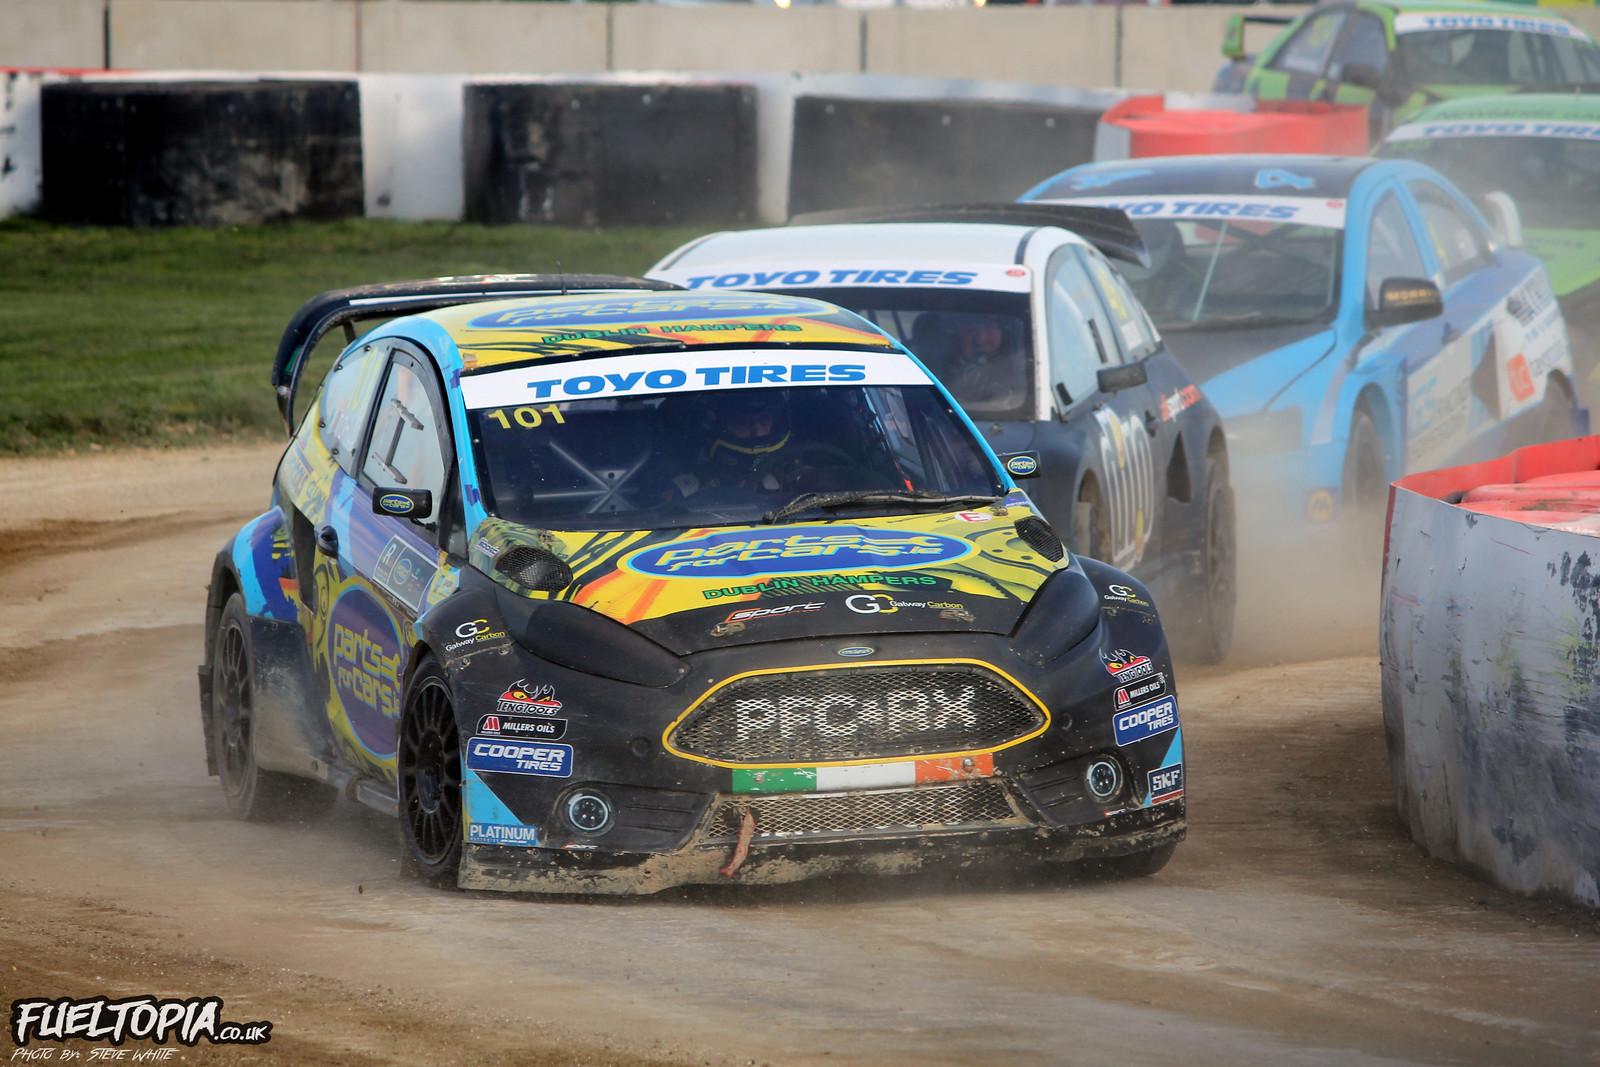 Derek Tohill Ford Fiesta Silverstone BRX British Rallycross Championship 2019 Steve White Fueltopia